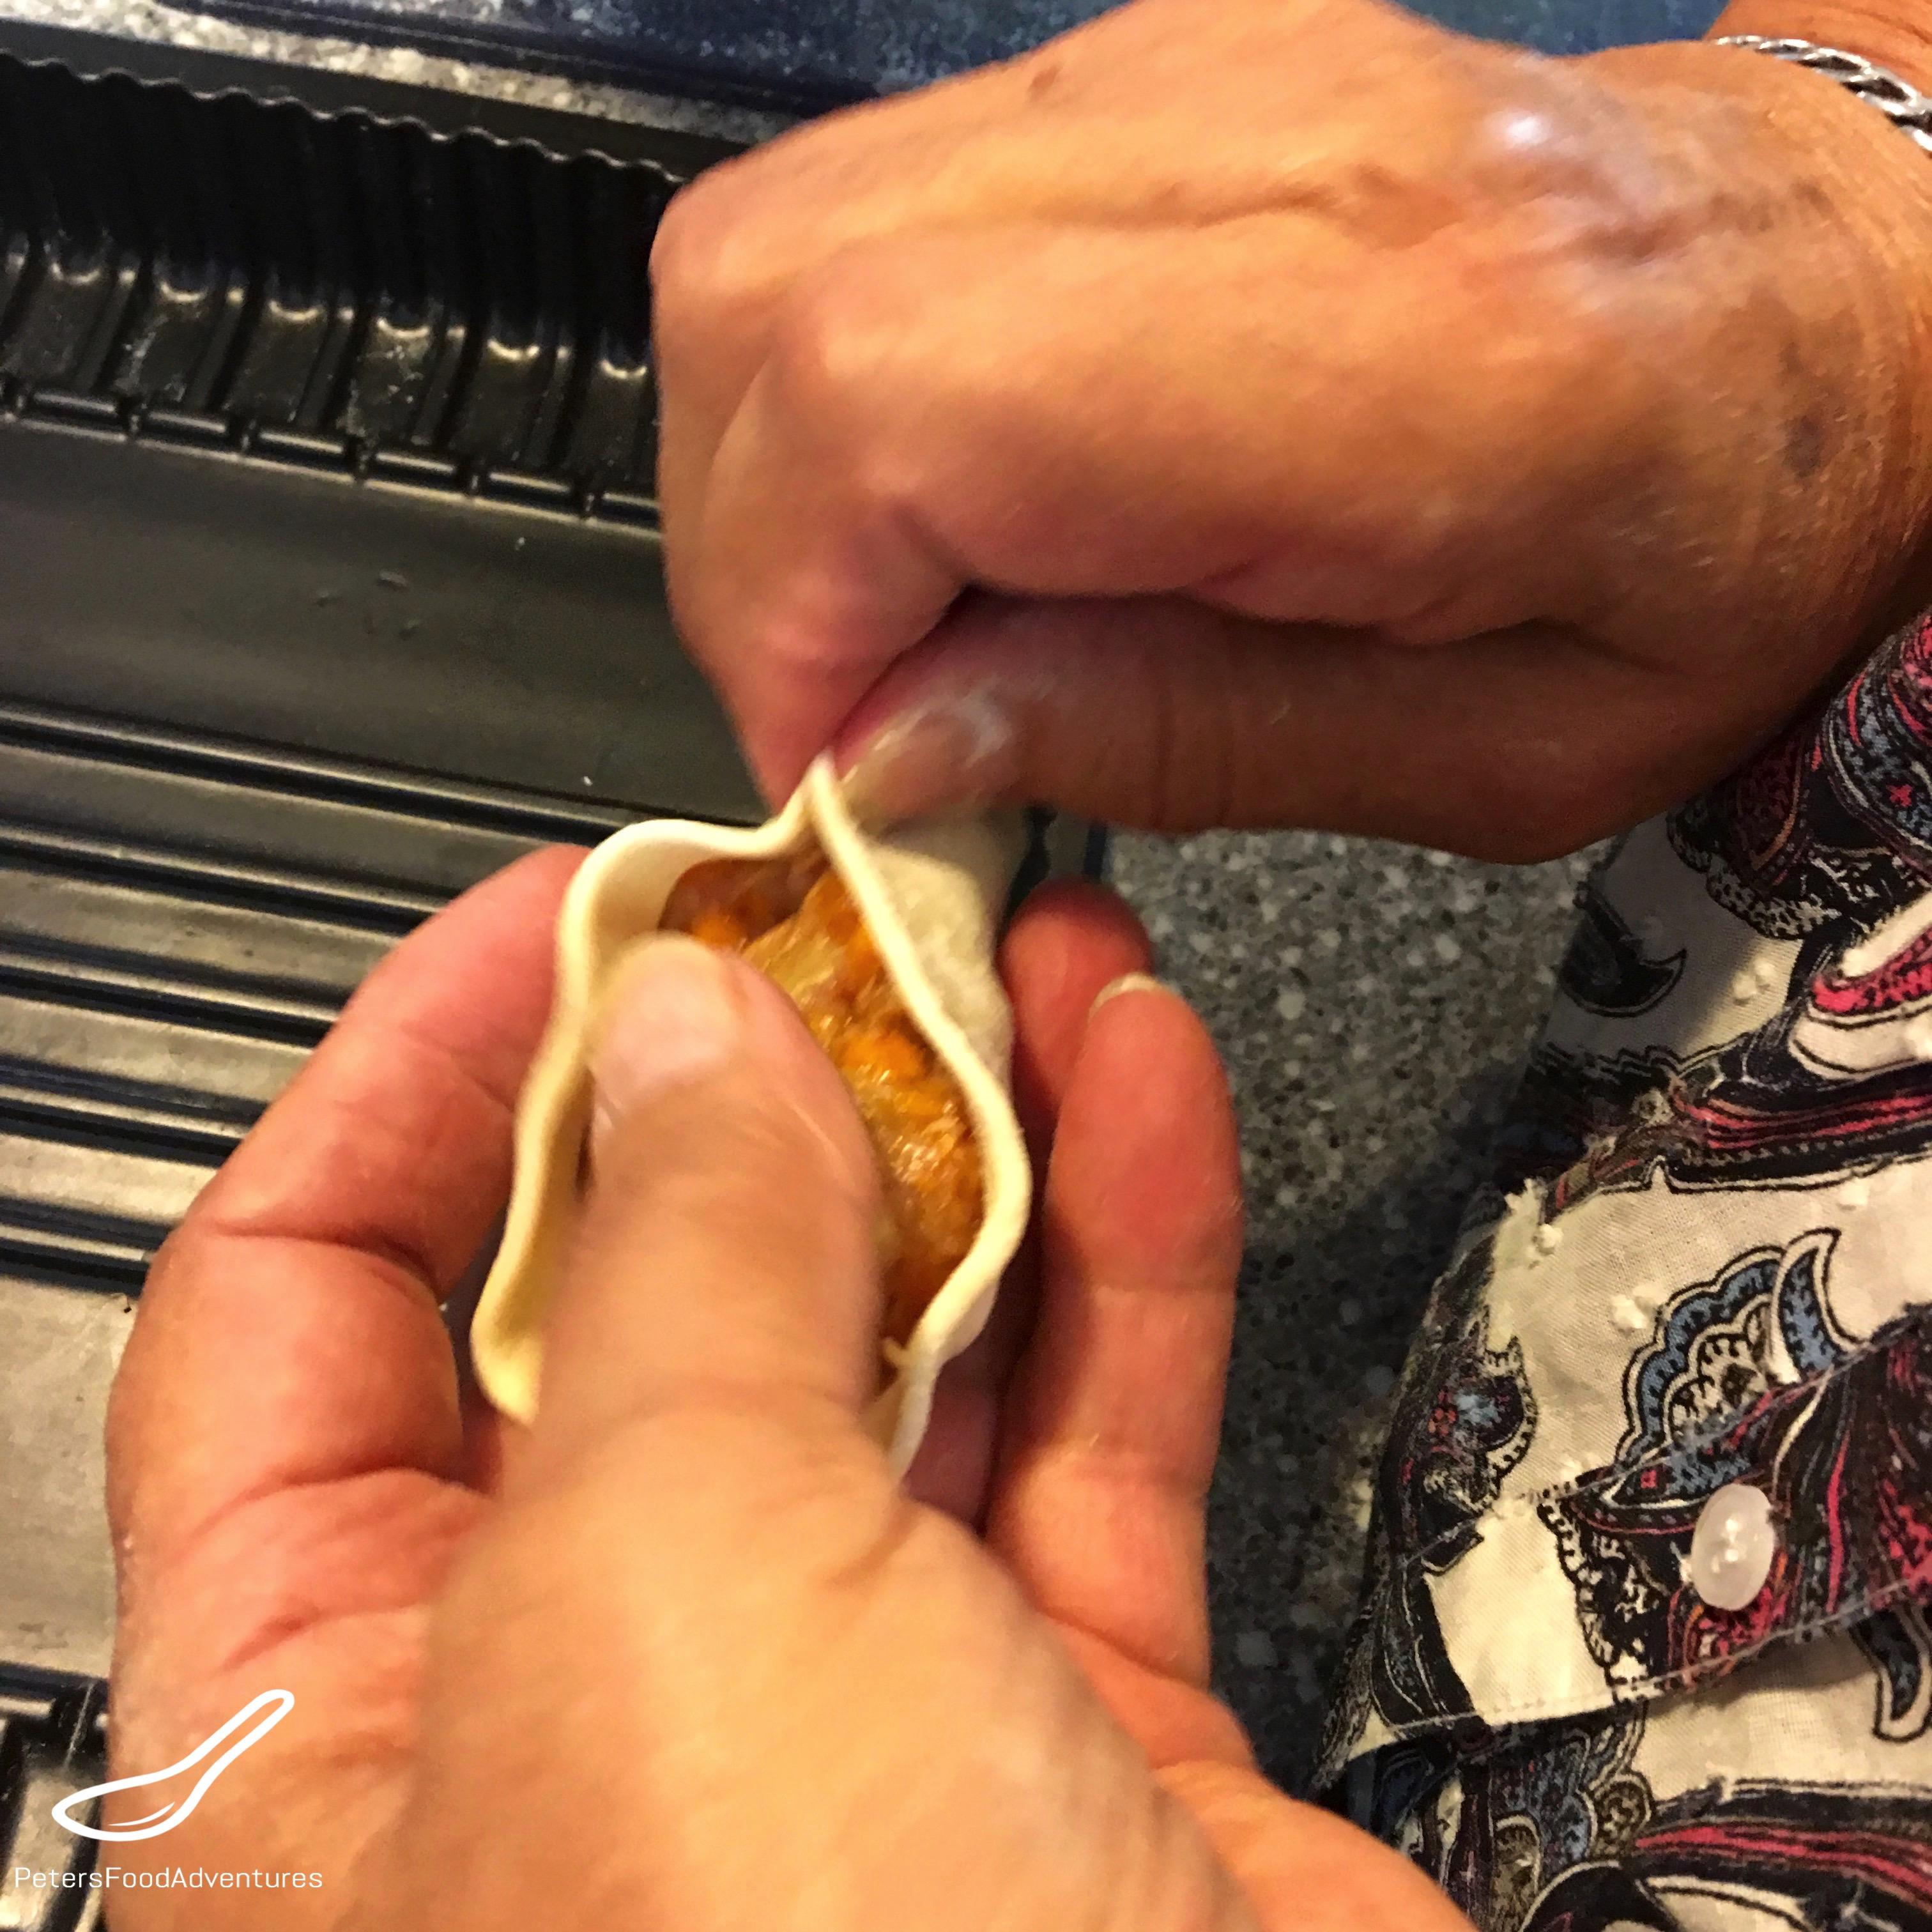 Manti Steamed Dumplings (Манты) pinching dough